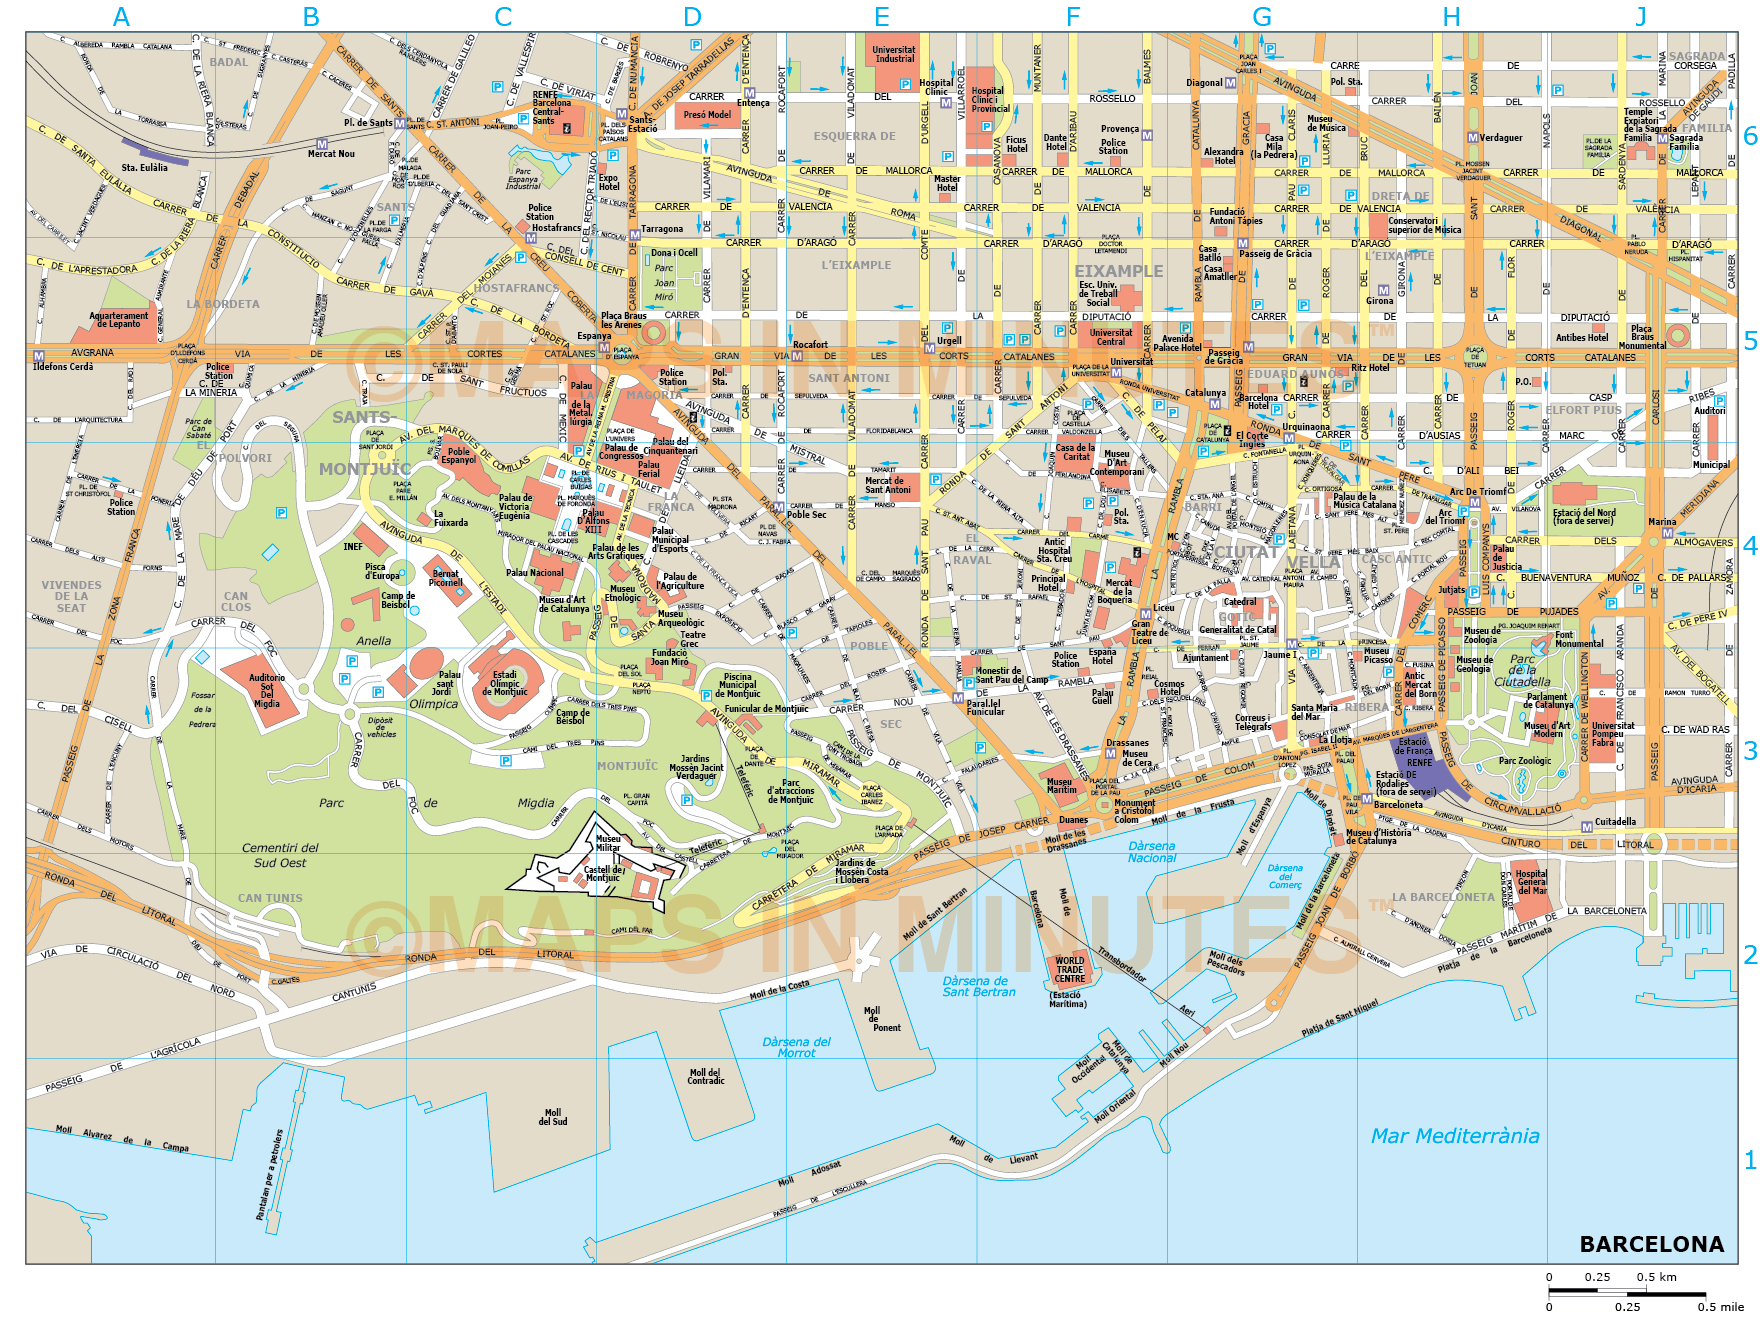 Printable Map Of Barcelona And Travel Information | Download Free - Printable Map Of Barcelona